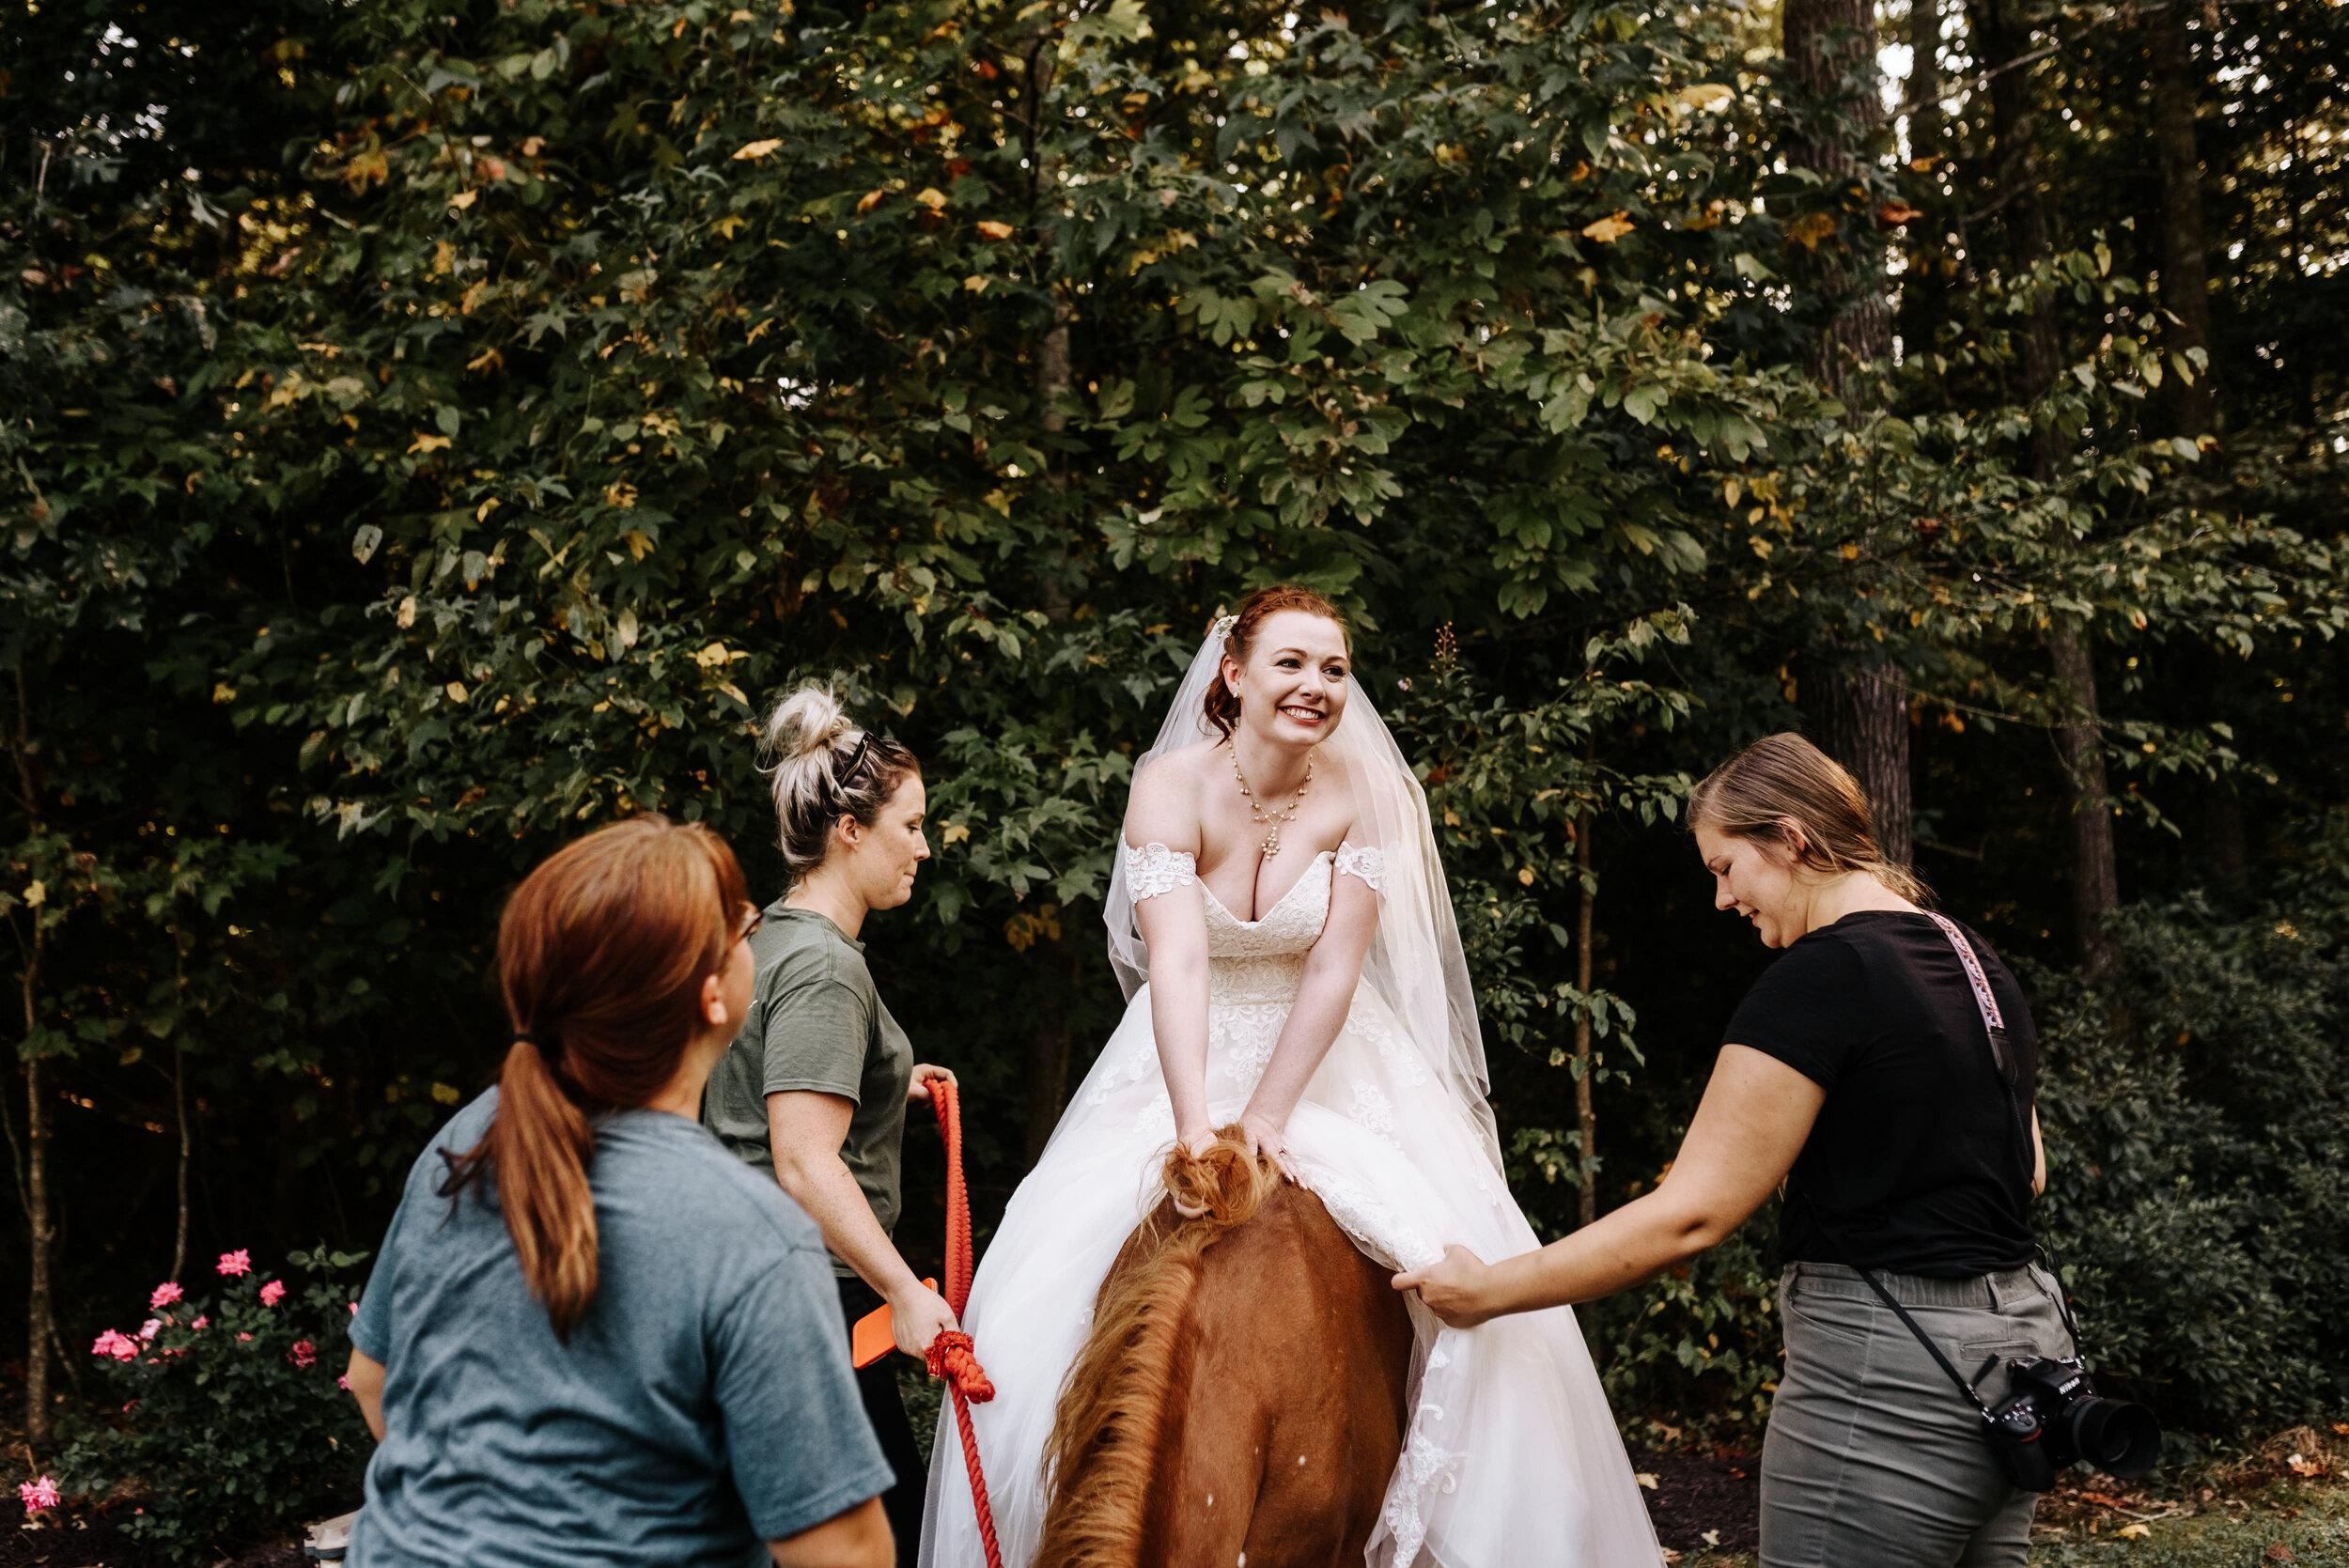 Rachel_David_Wedding_Richmond_Virginia_Photography_by_V_35.jpg